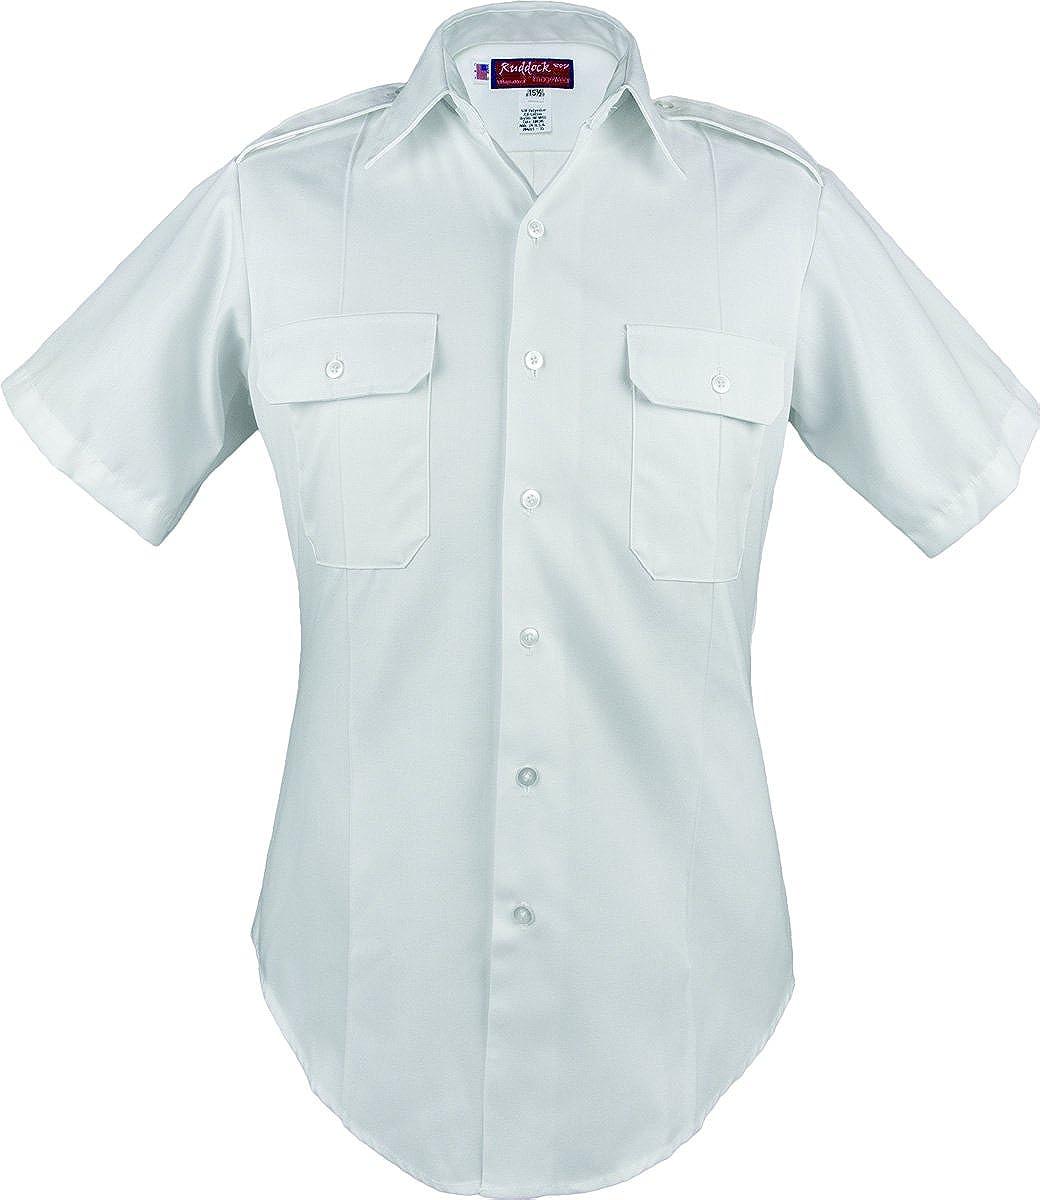 Short Sleeve quality assurance Under blast sales White Duty Shirt